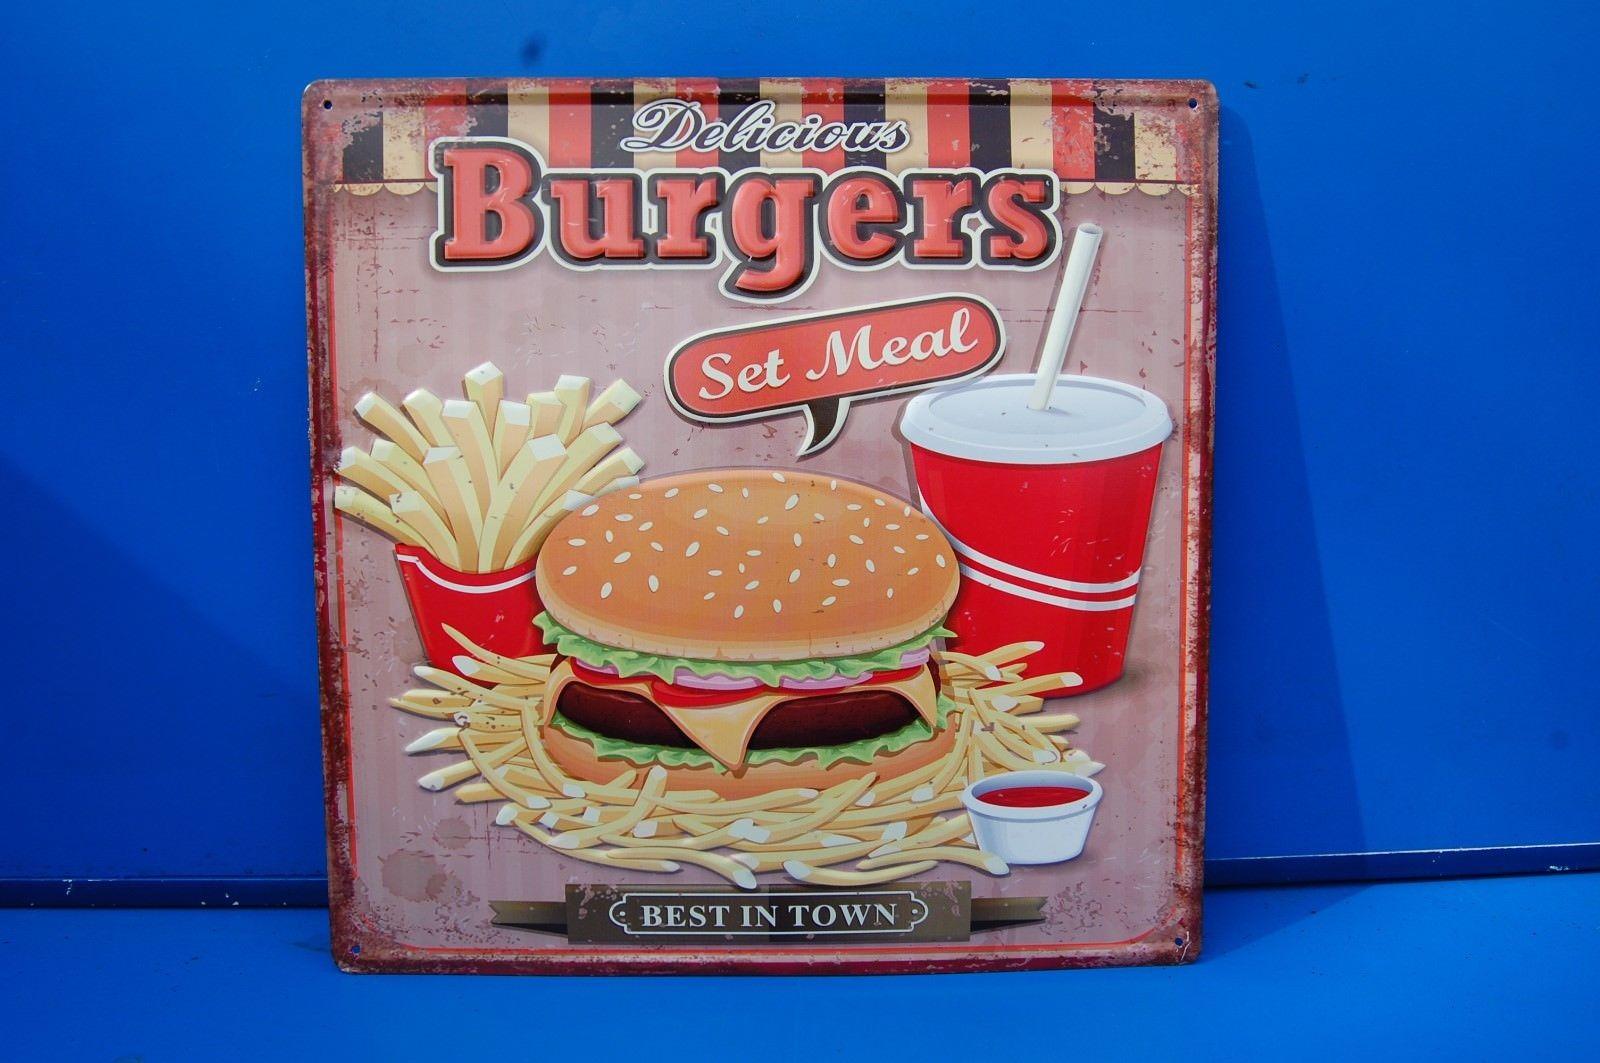 Wandschild Nostalgie Schild, Burgers, Wandbield, Reklame Schild 38 x 38 cm